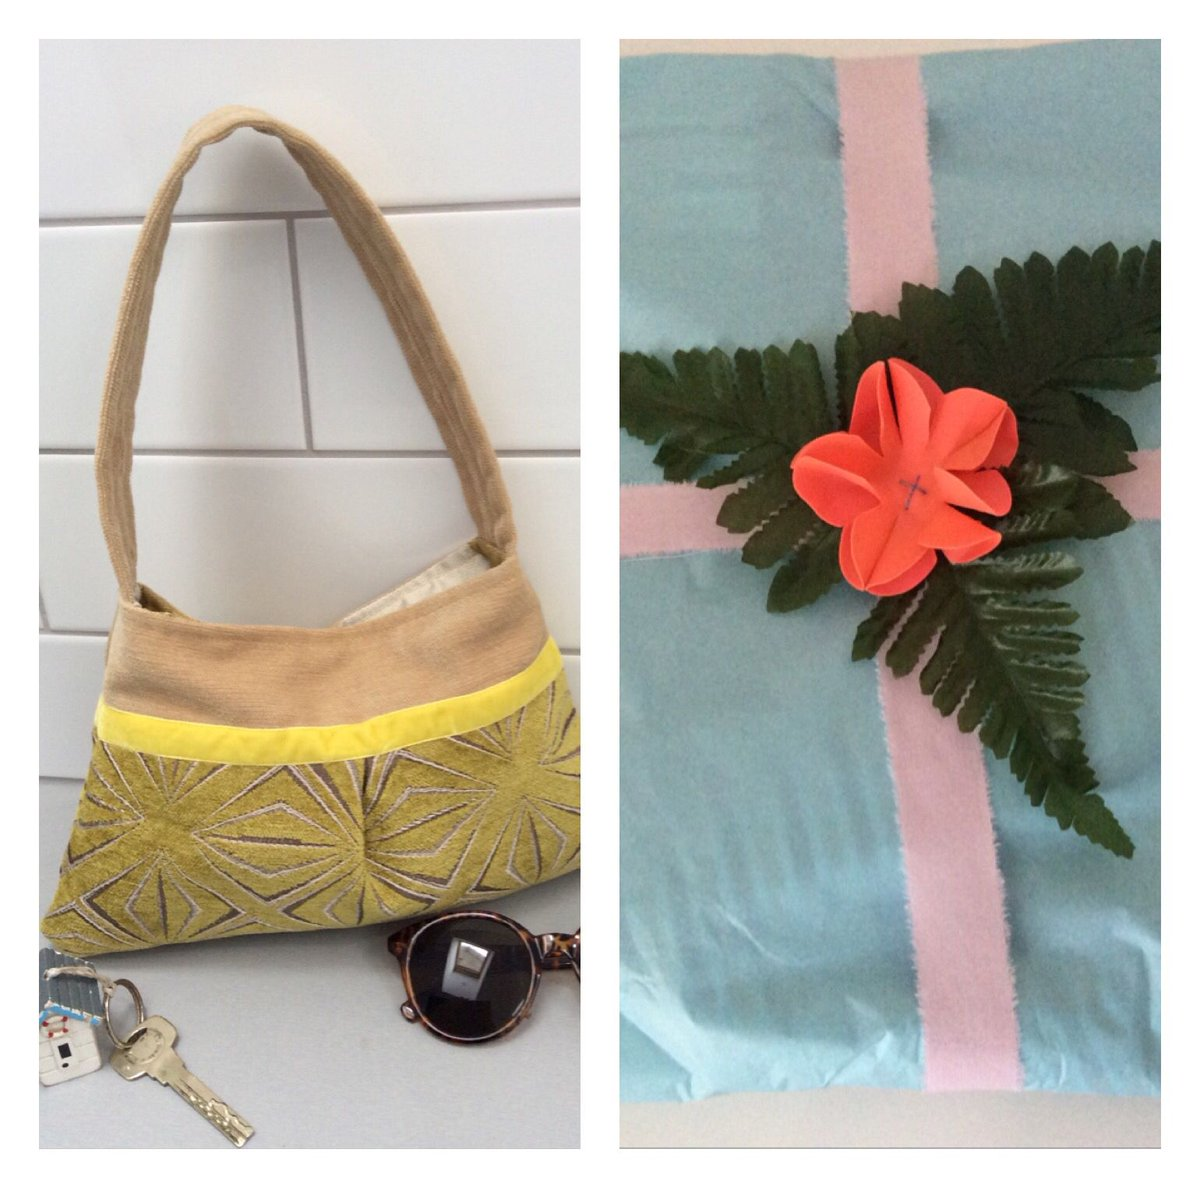 Samm Designs On Twitter Does Recycled Materials Gift Wrap Too Womaninbizhour Wnukrt Craftbuzz Ecofriendly Handbags Giftforher